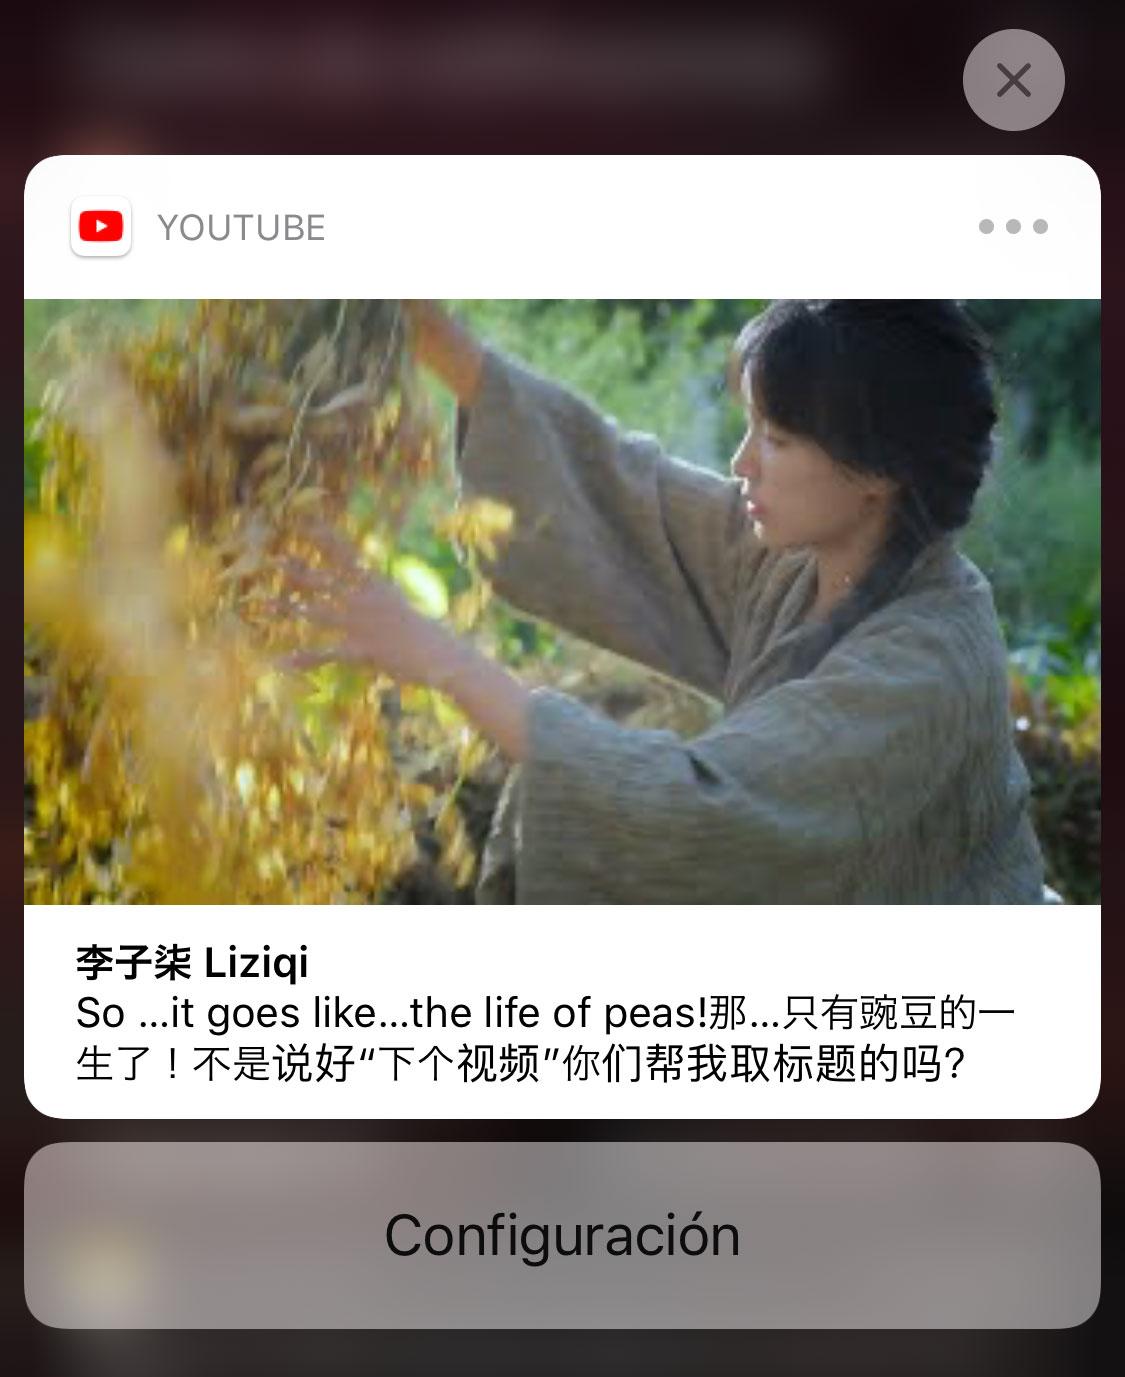 3D Touch o Haptic Touch en una notificación de YouTube